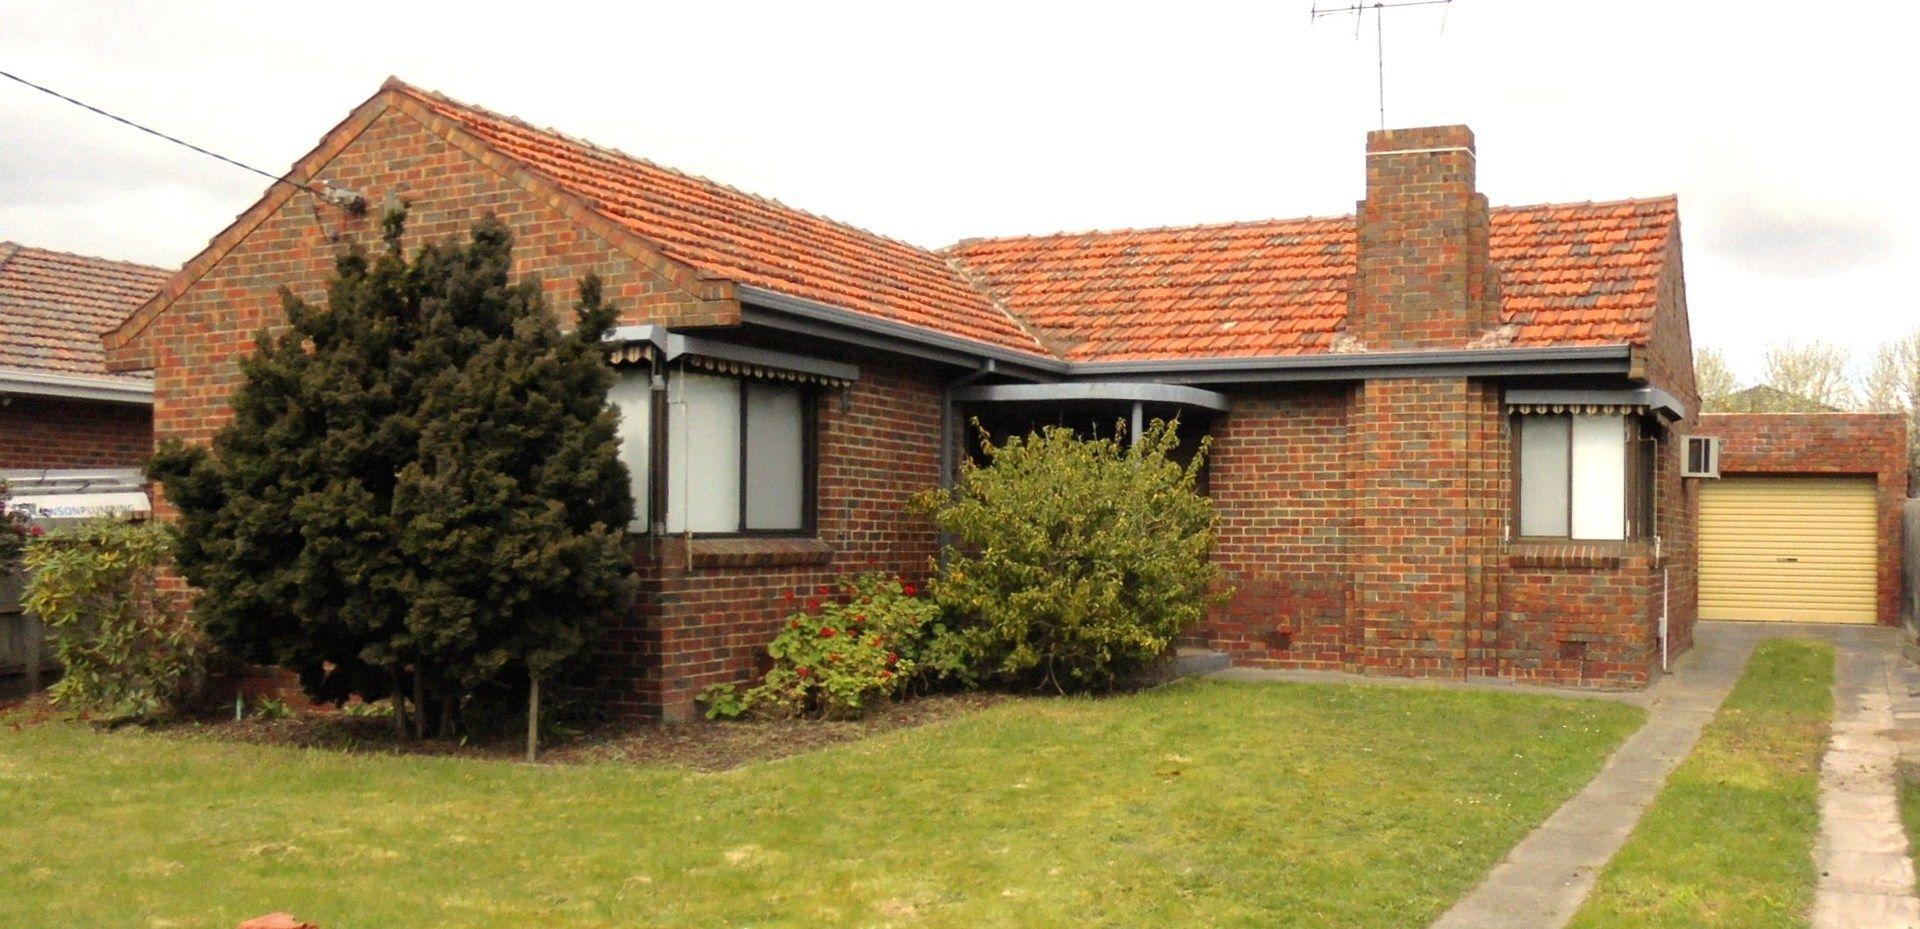 38 Fakenham Road, Ashburton VIC 3147, Image 0